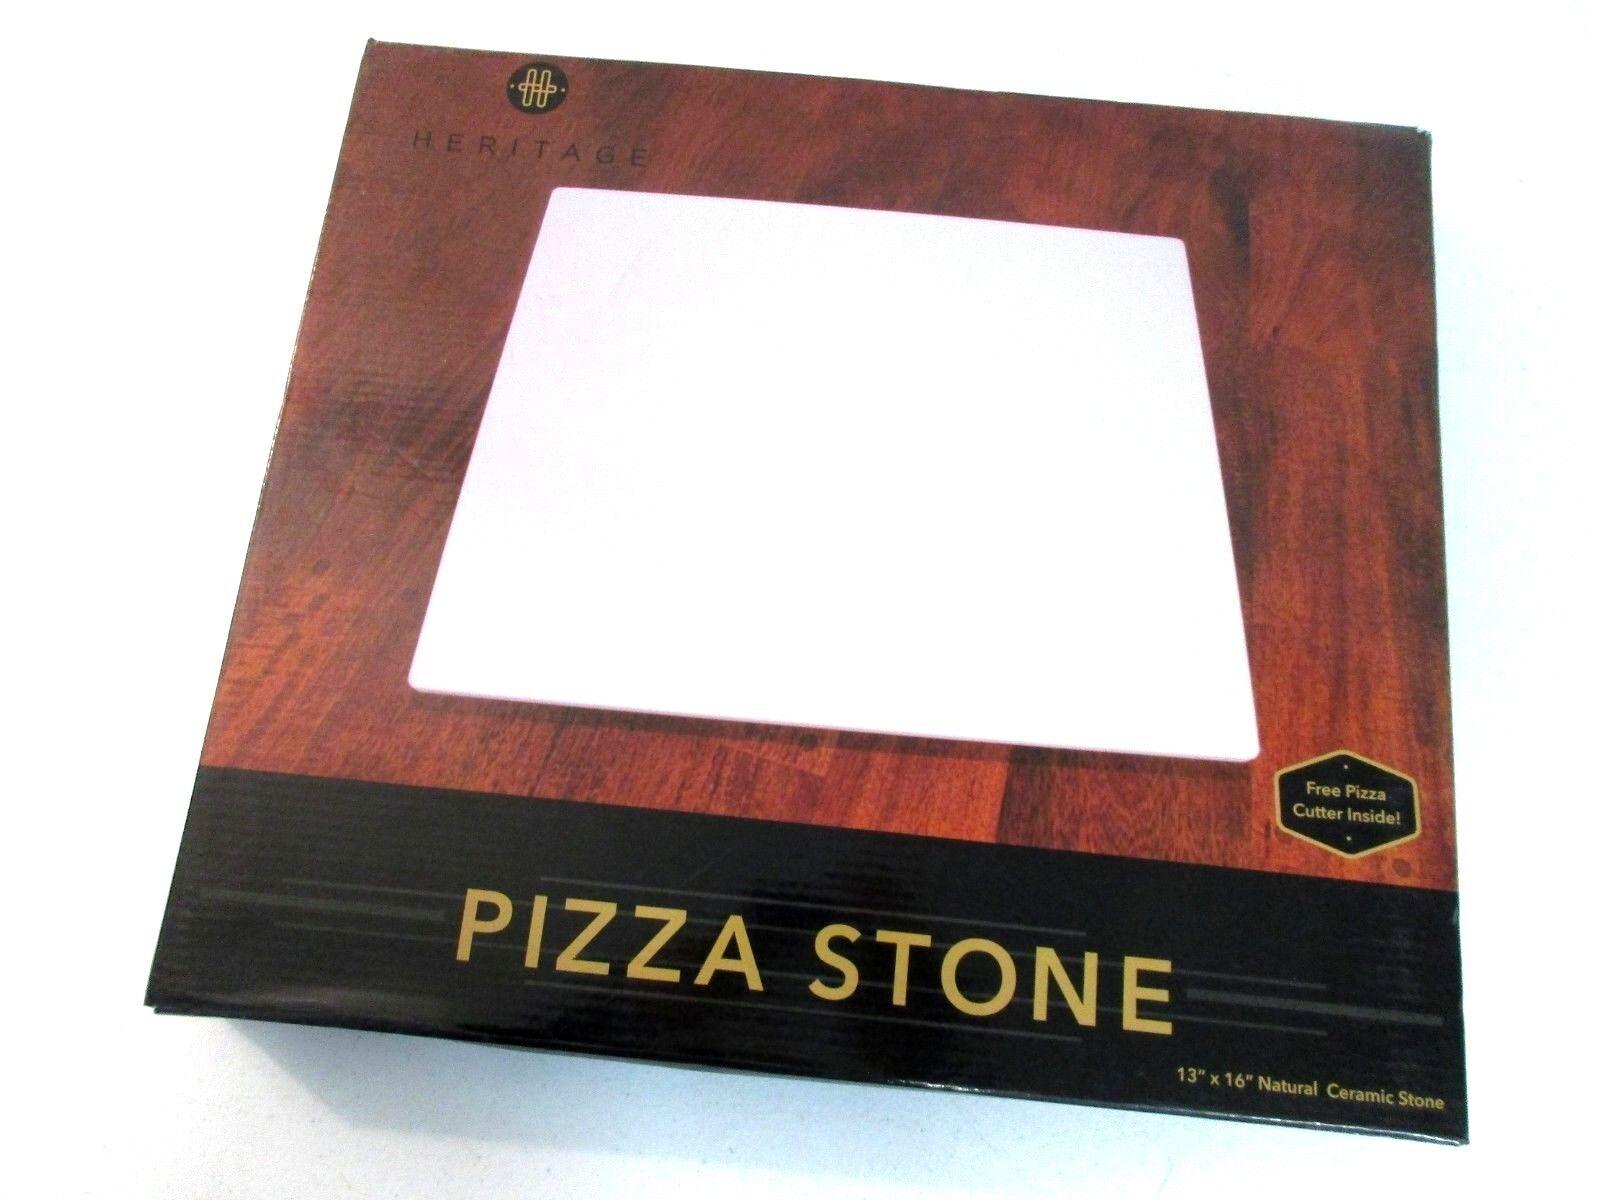 "Heritage Ceramic Pizza Stone 13"" x 16"" Baking Stones for"